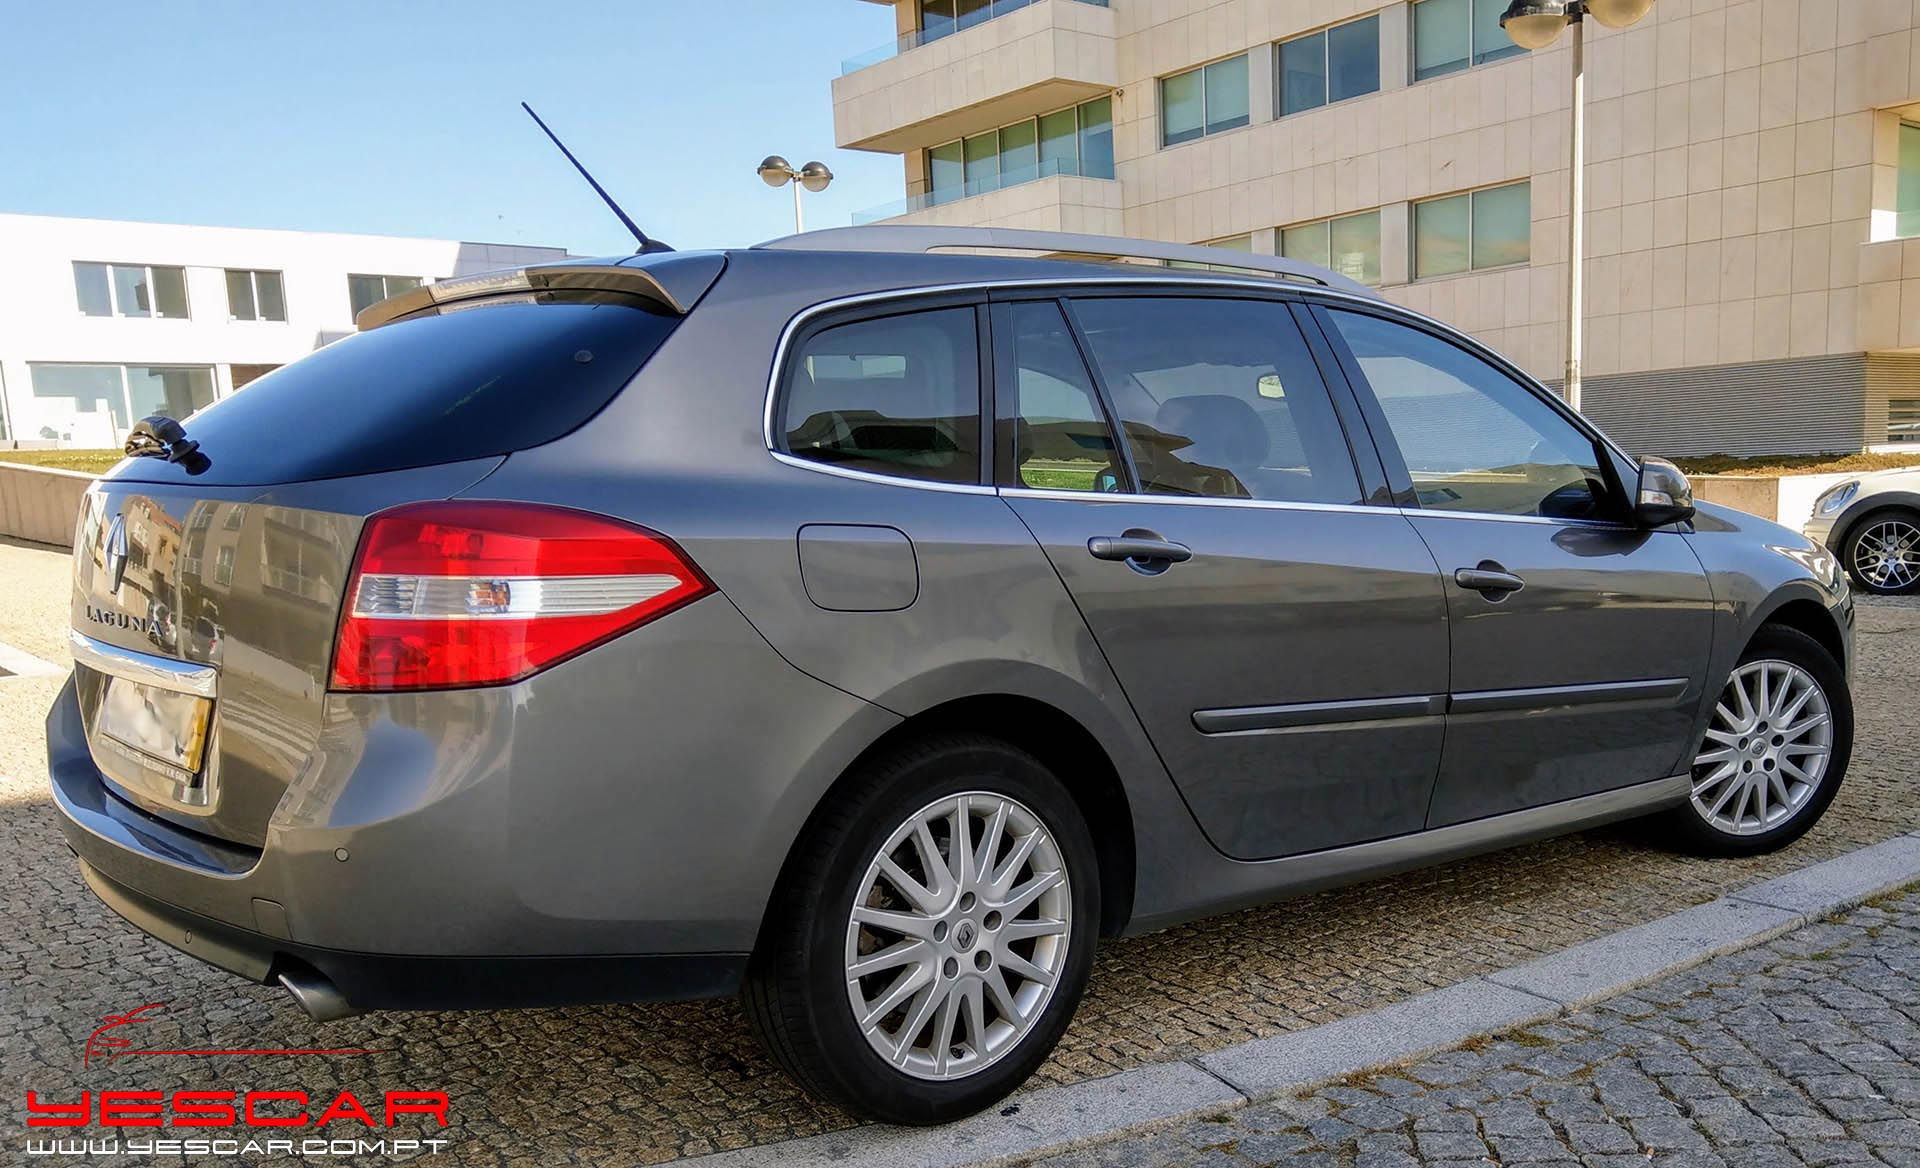 YESCAR_Renault_Laguna_SW (13)